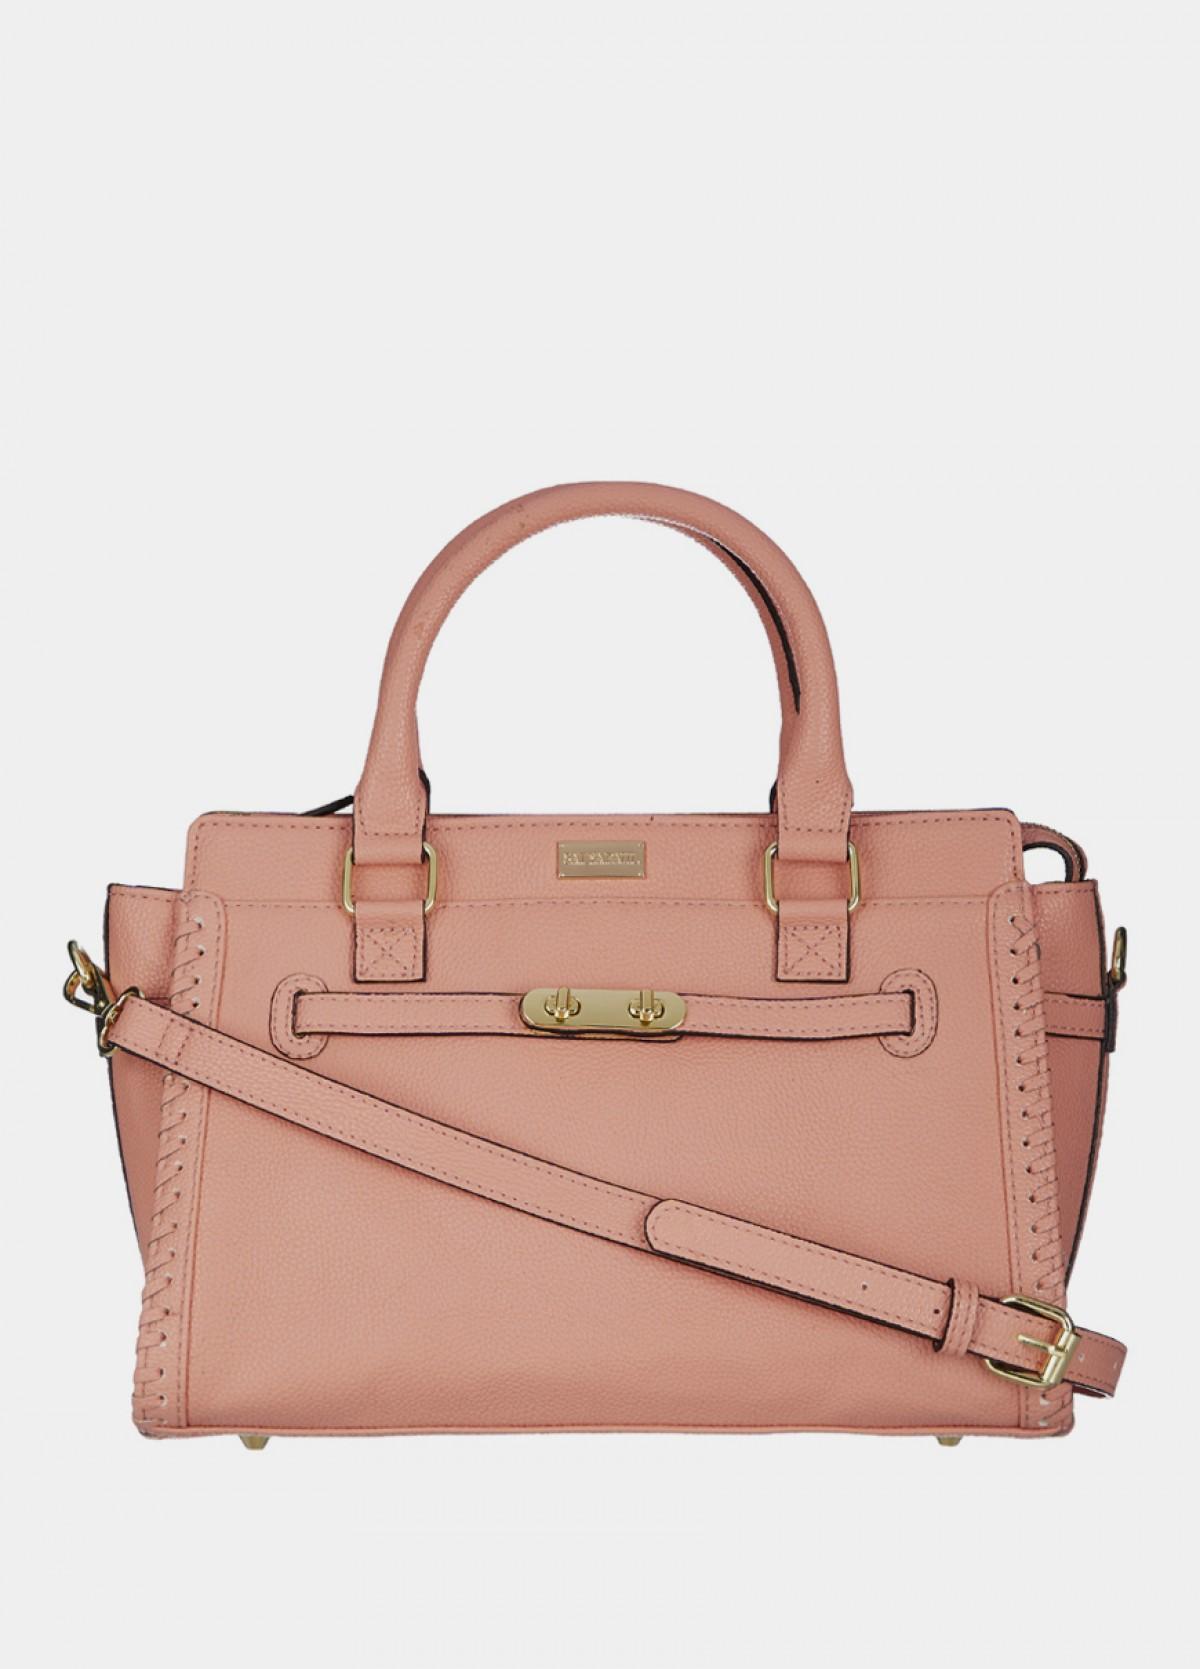 The Peach Handbag